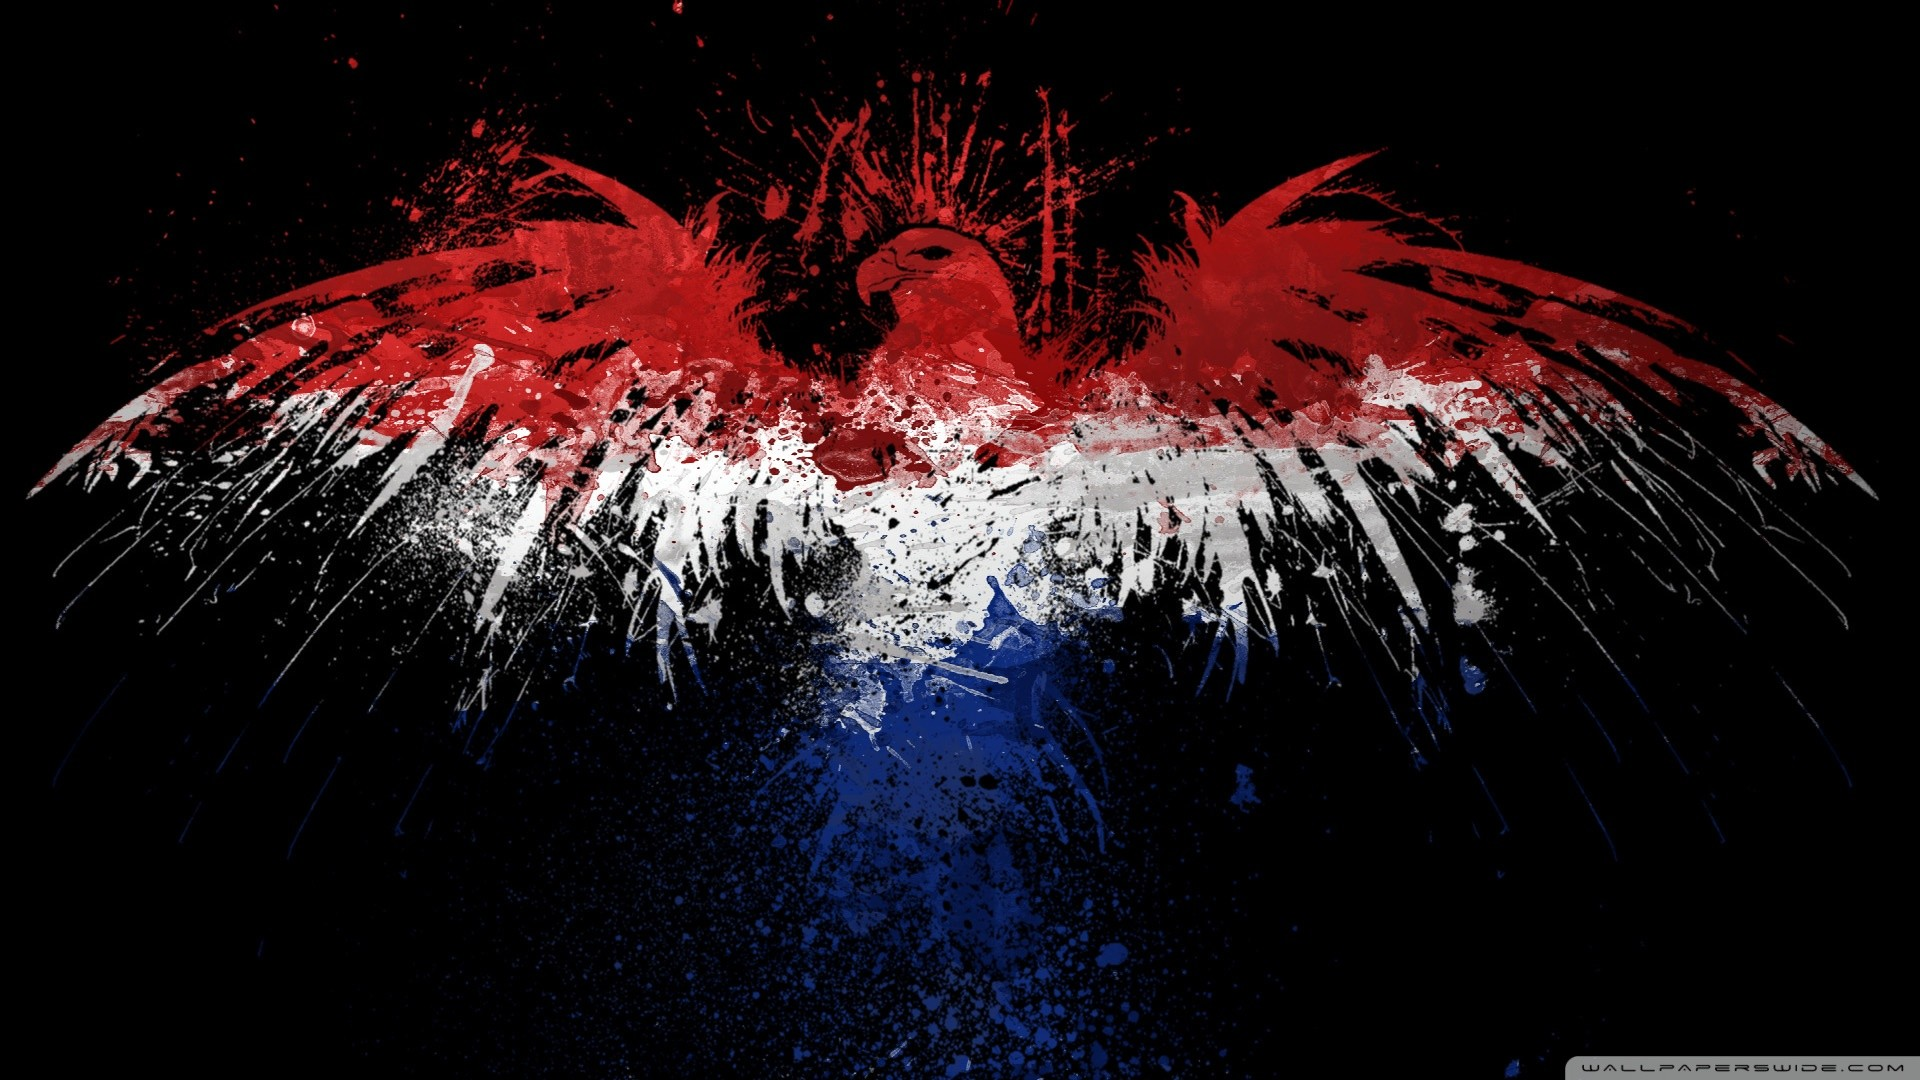 Patriotic Wallpaper Usa Flag Eagle: Eagle Flag Wallpaper (57+ Images